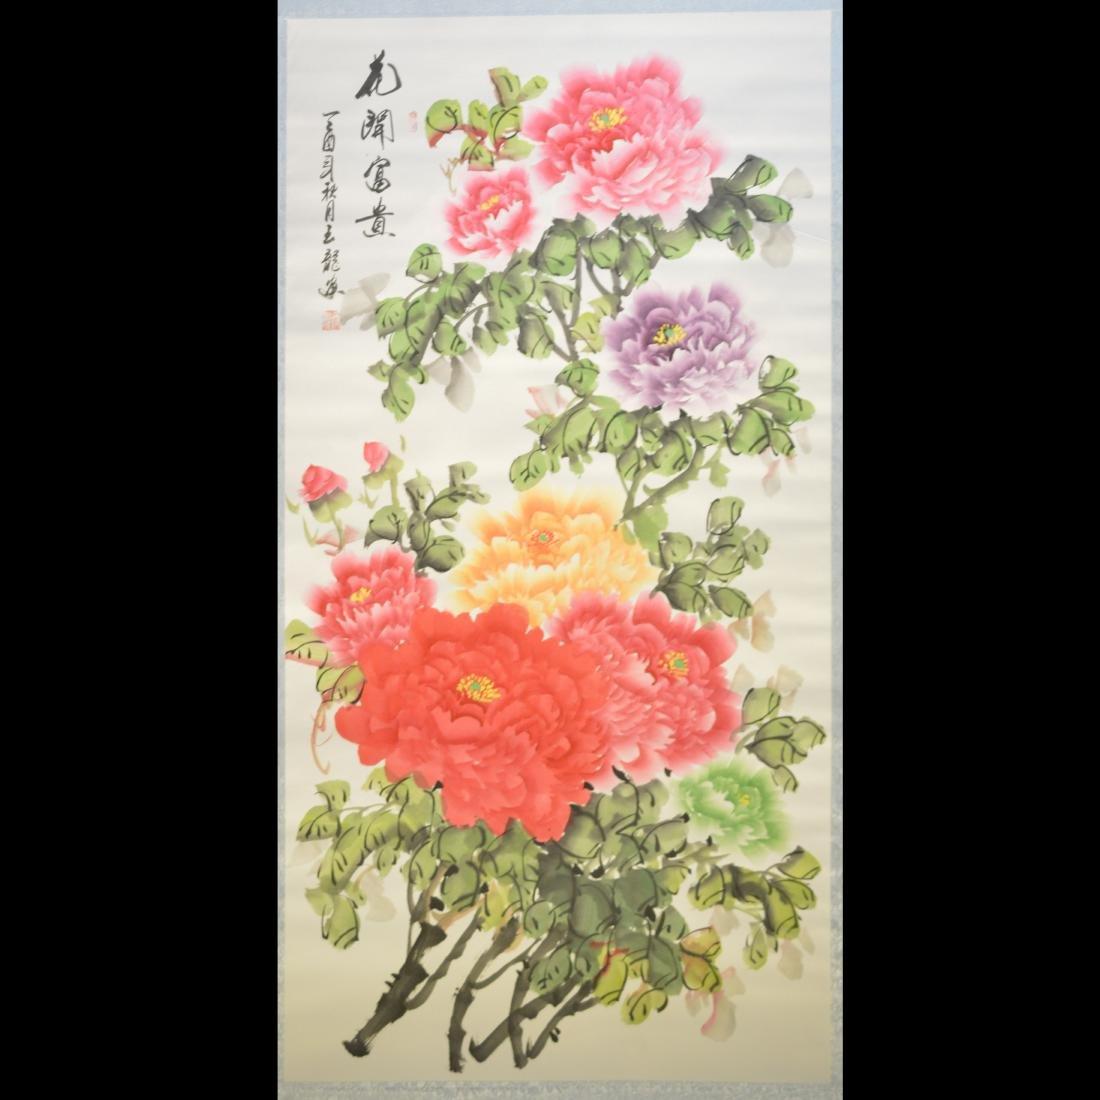 Flower Blossom Painting